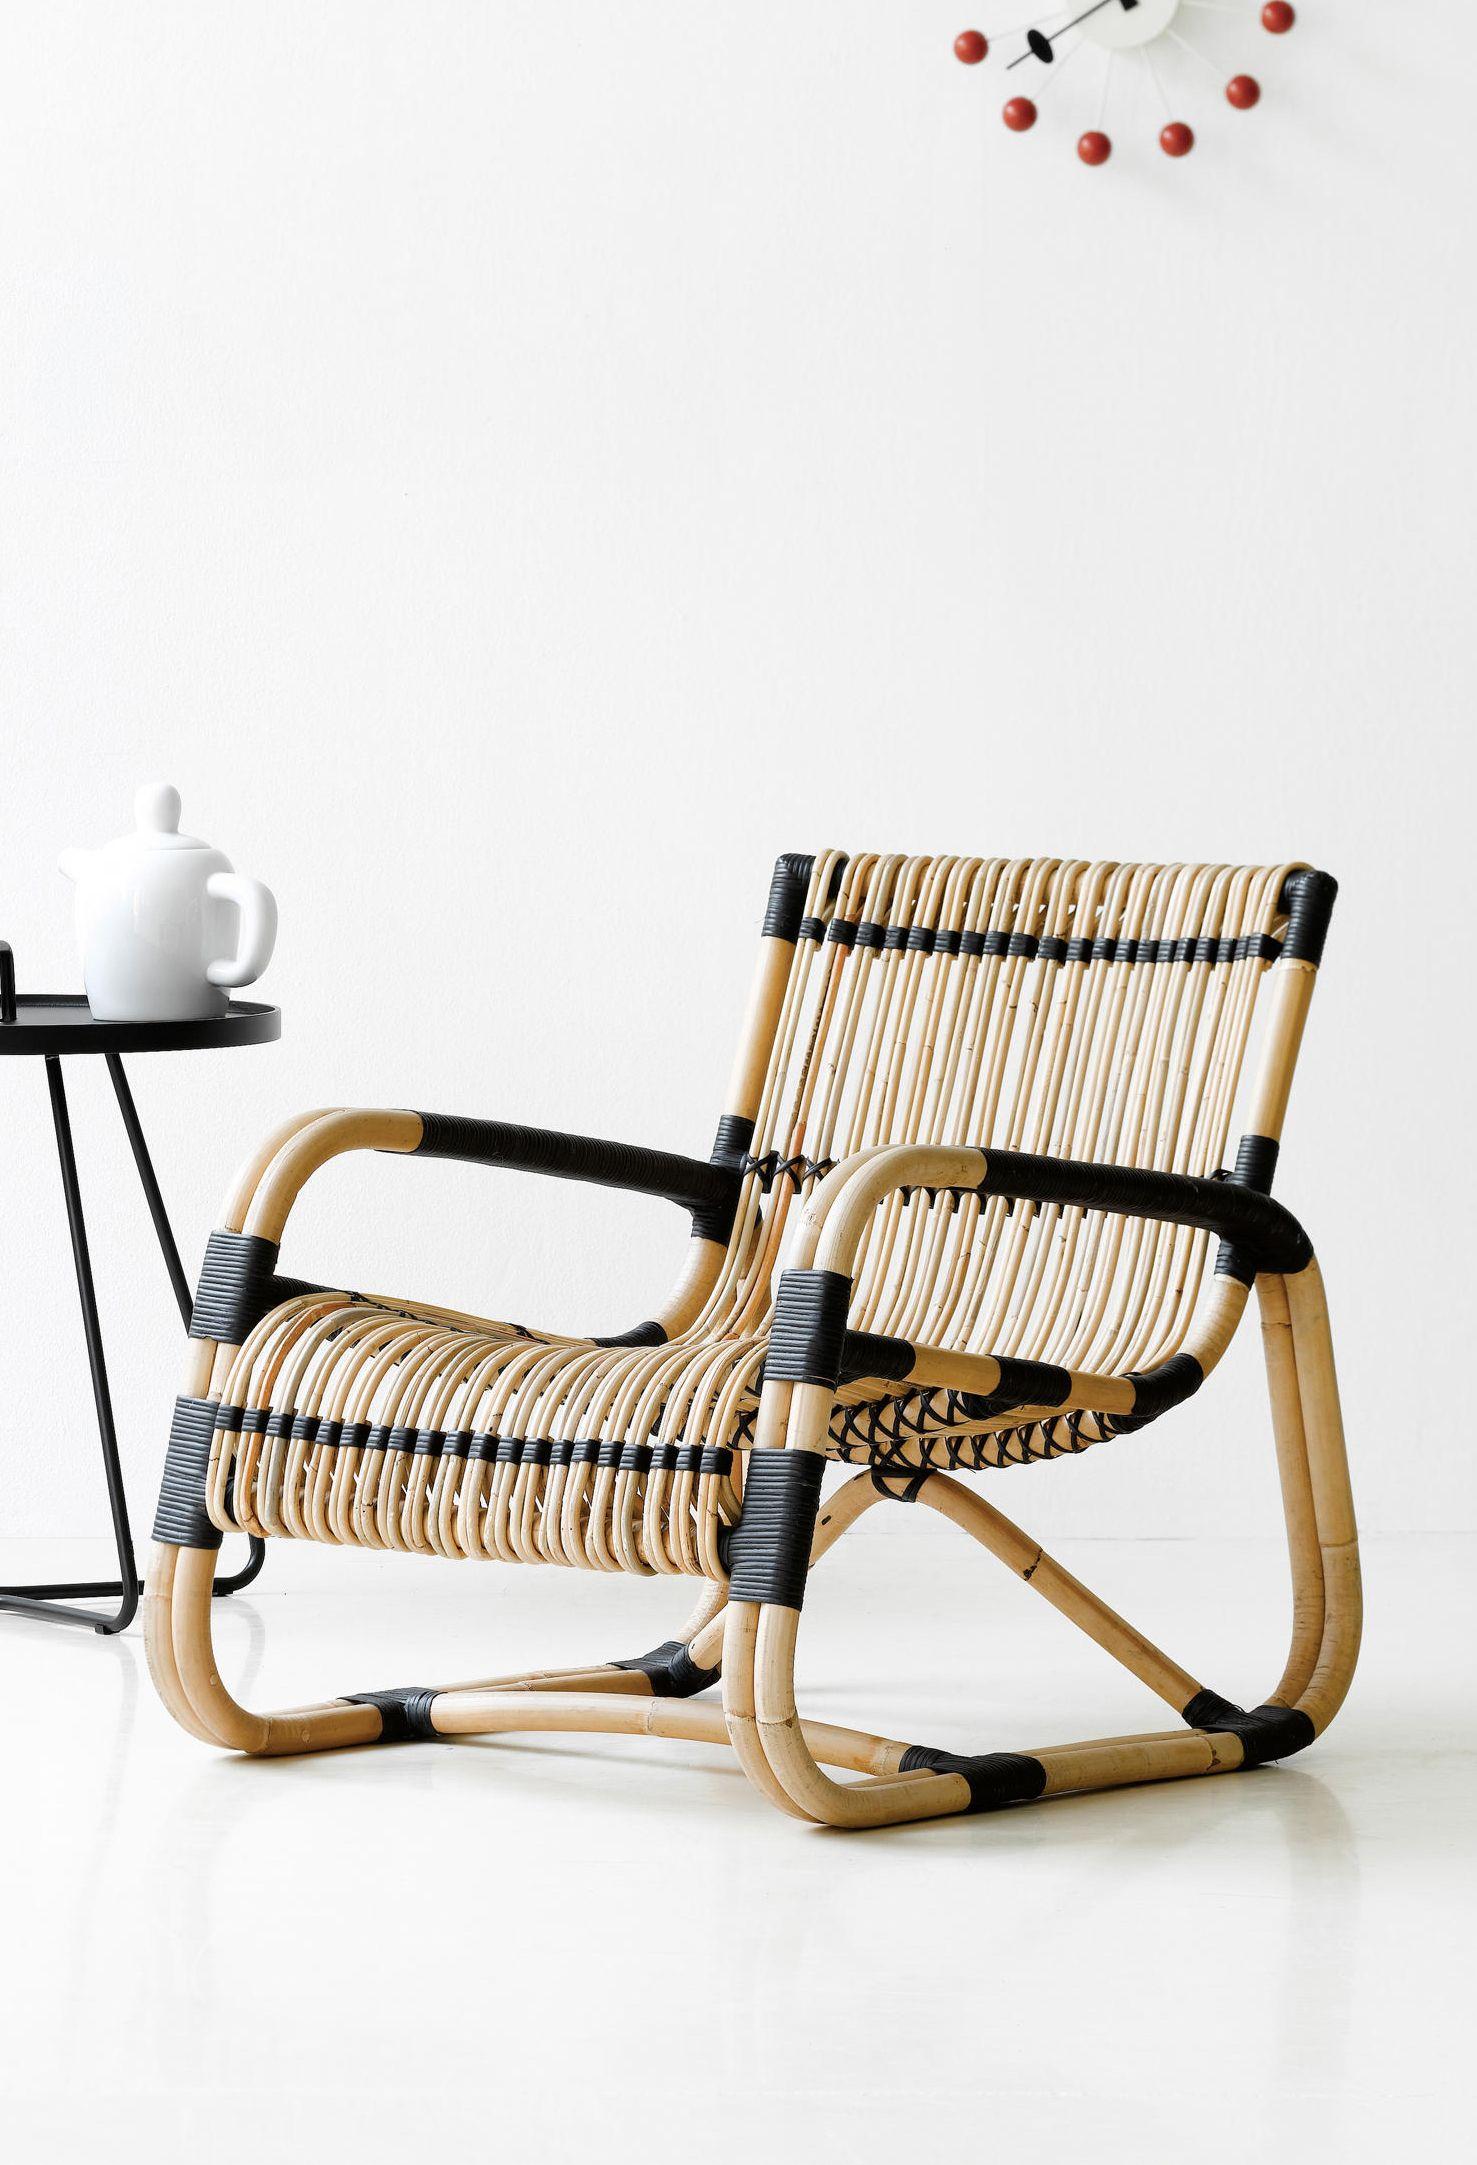 Curve Lounge Chair Cane Line Comfortable Outdoor Chairs Outdoor Chairs Pool Lounge Chairs